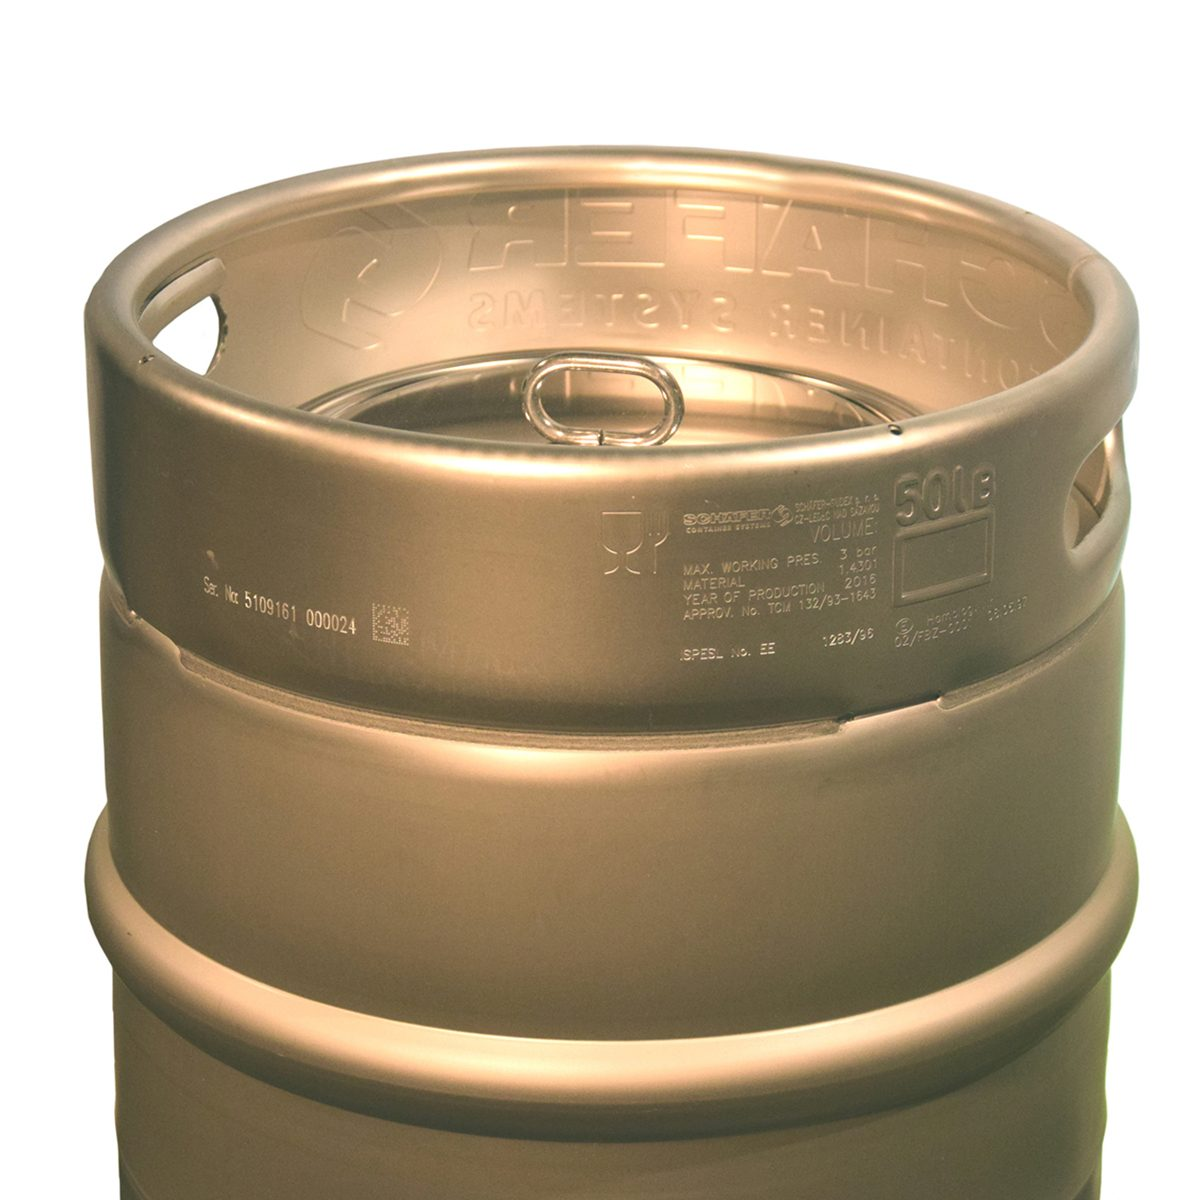 Bierfaß edelstahl